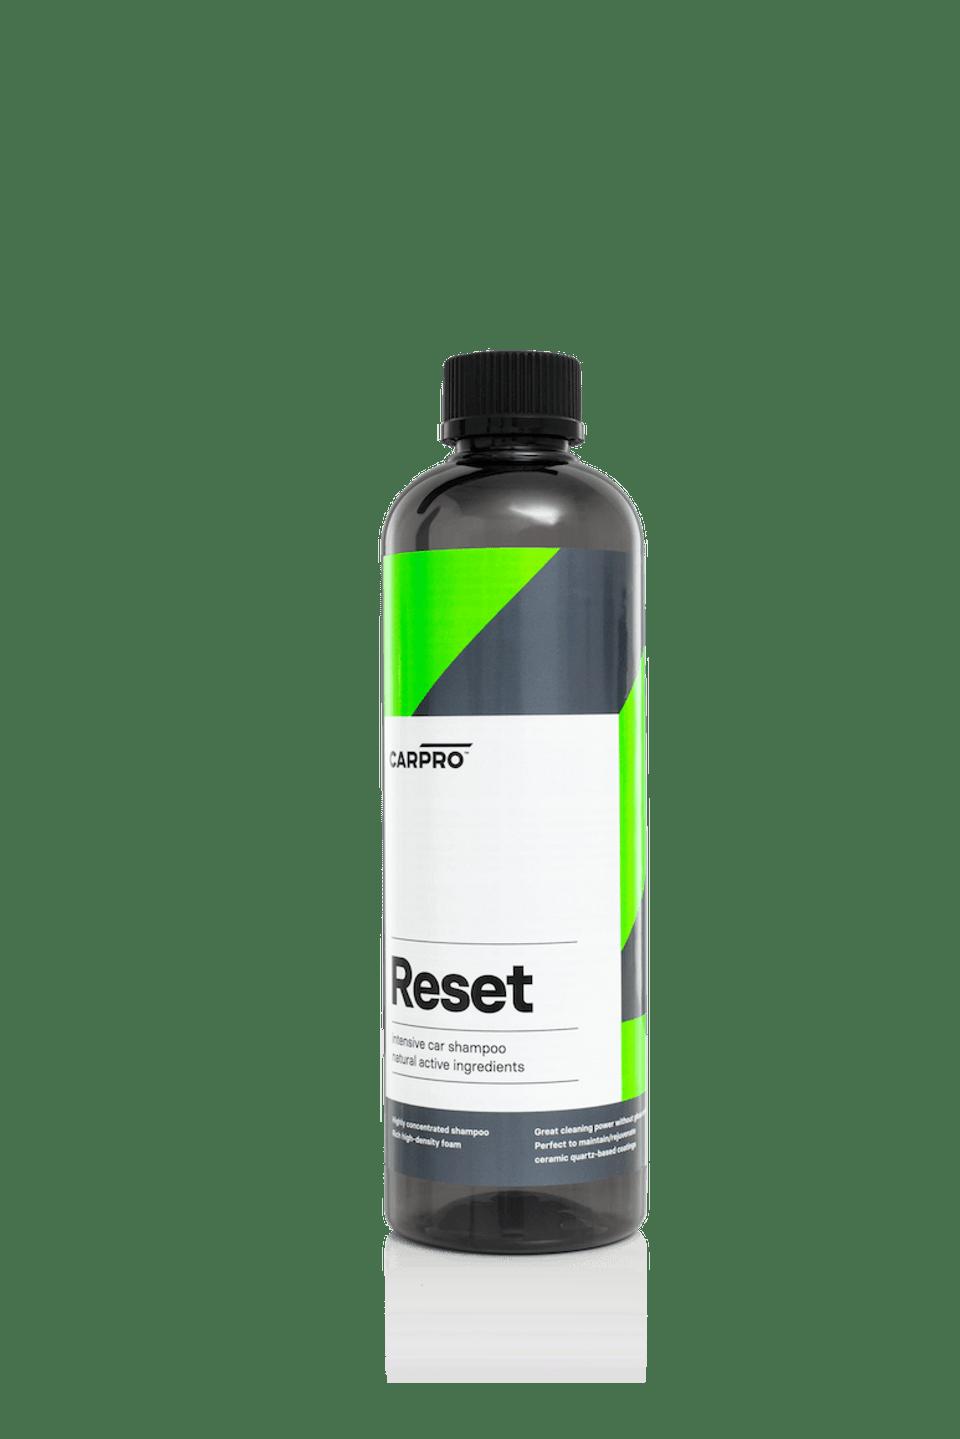 CarPro Reset Intensive Car Shampoo - 500 ml Formulated for Coatings